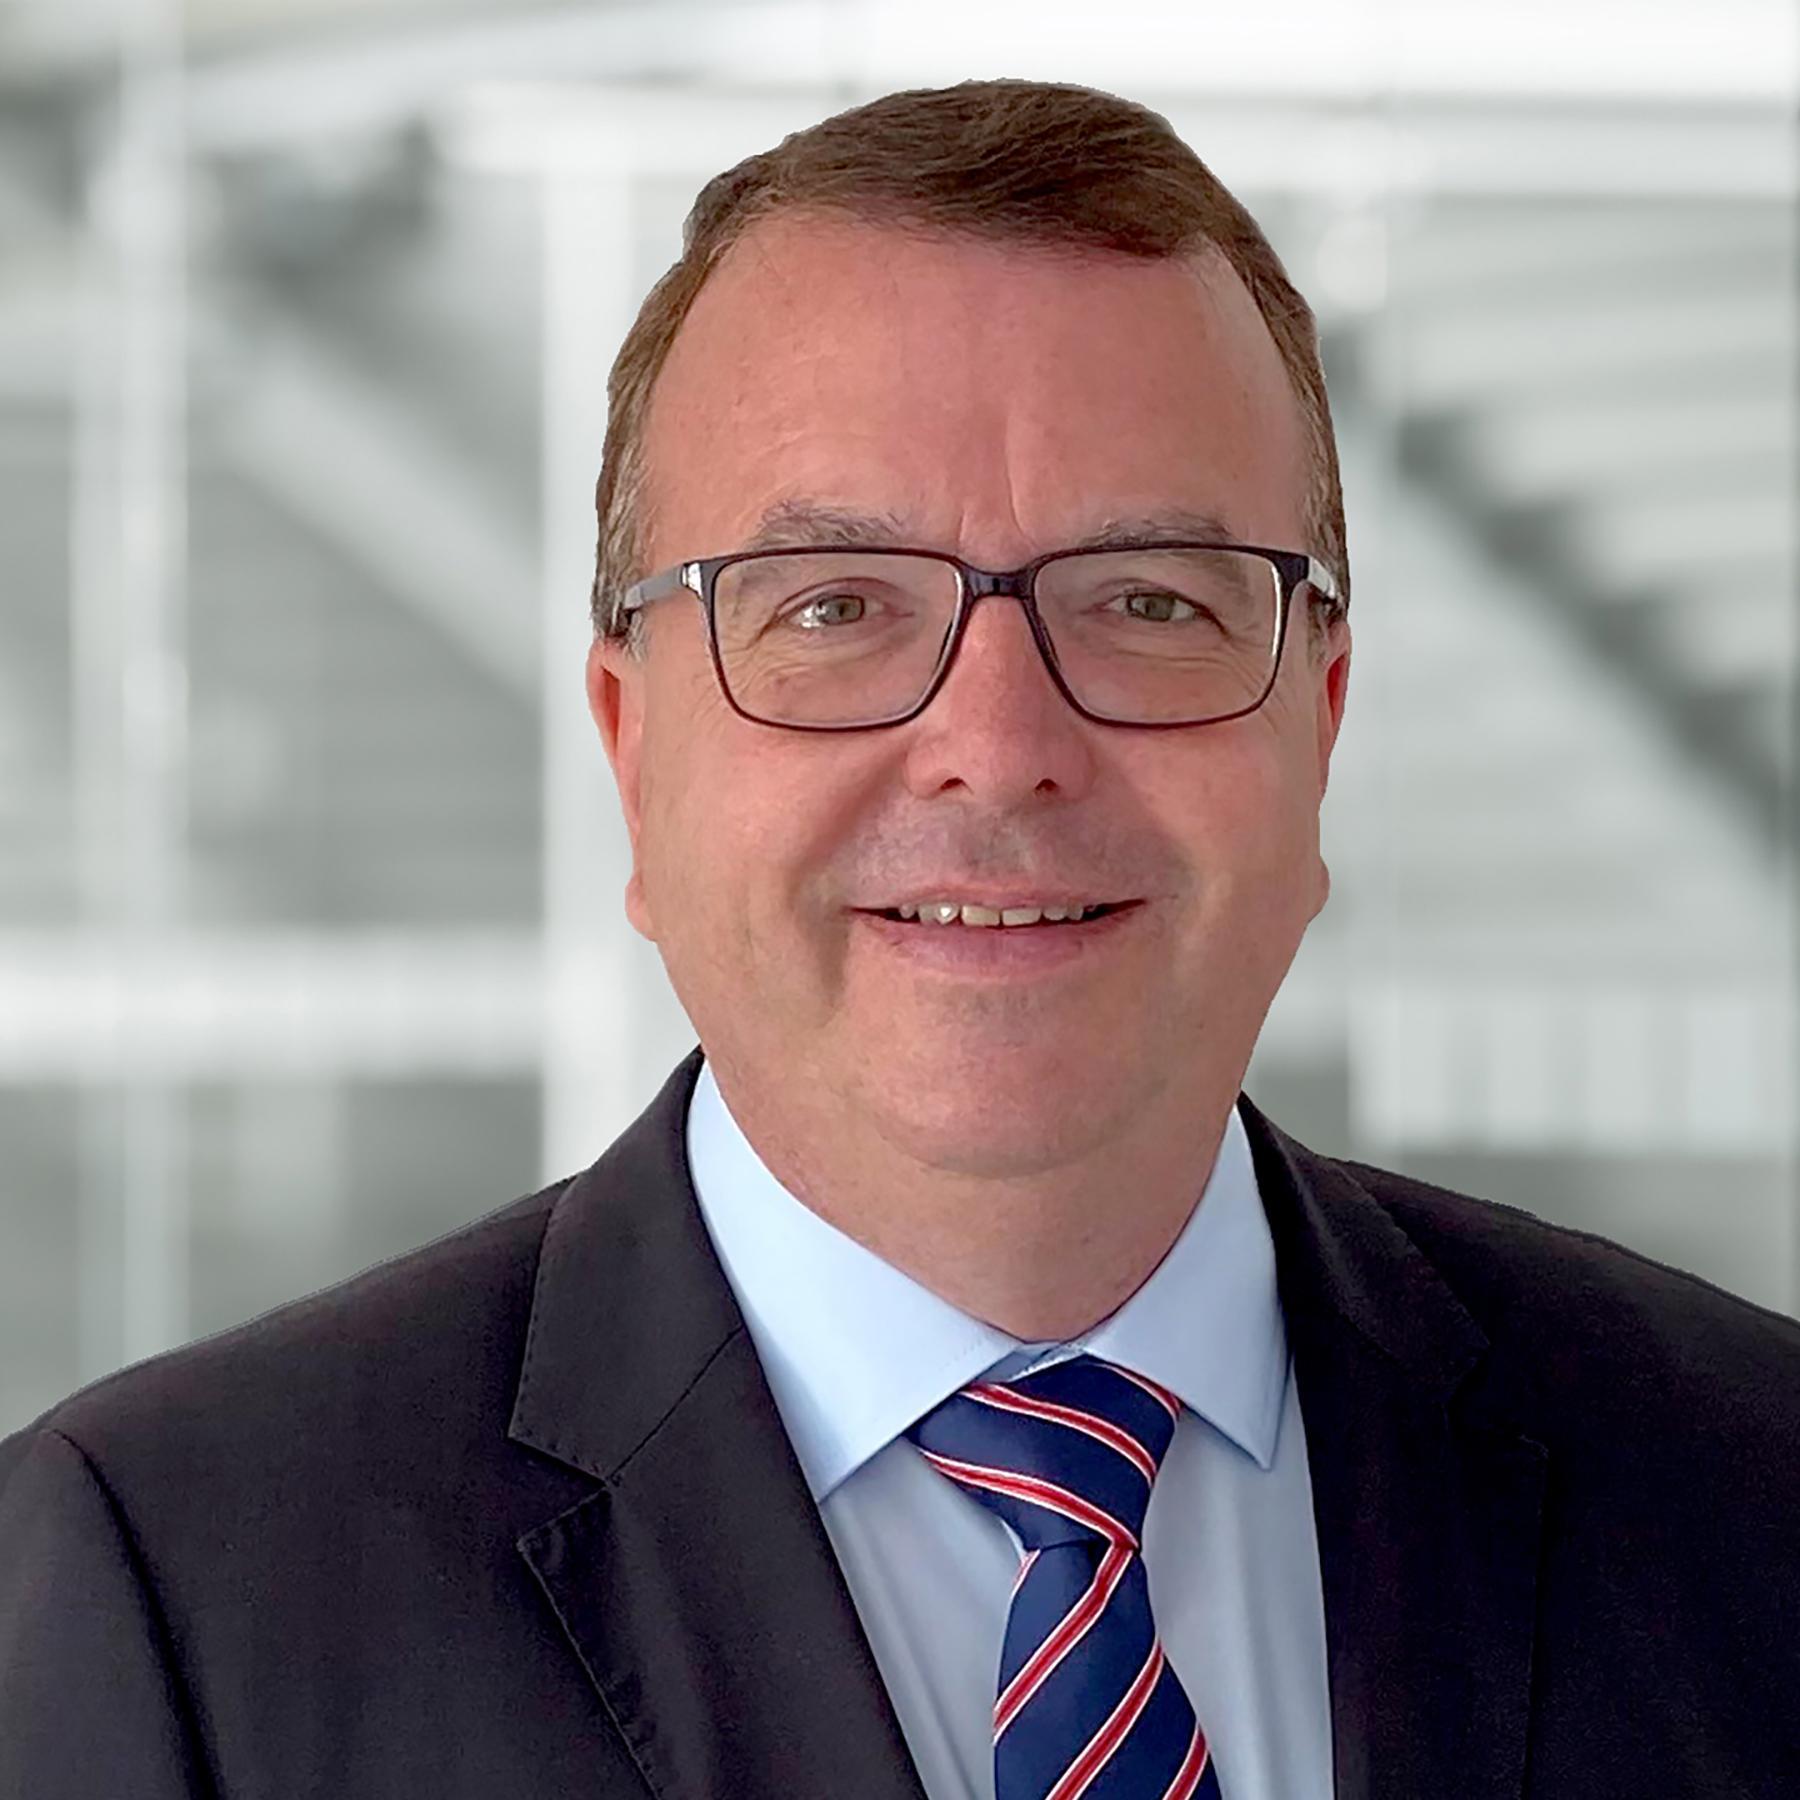 Hans Jahn